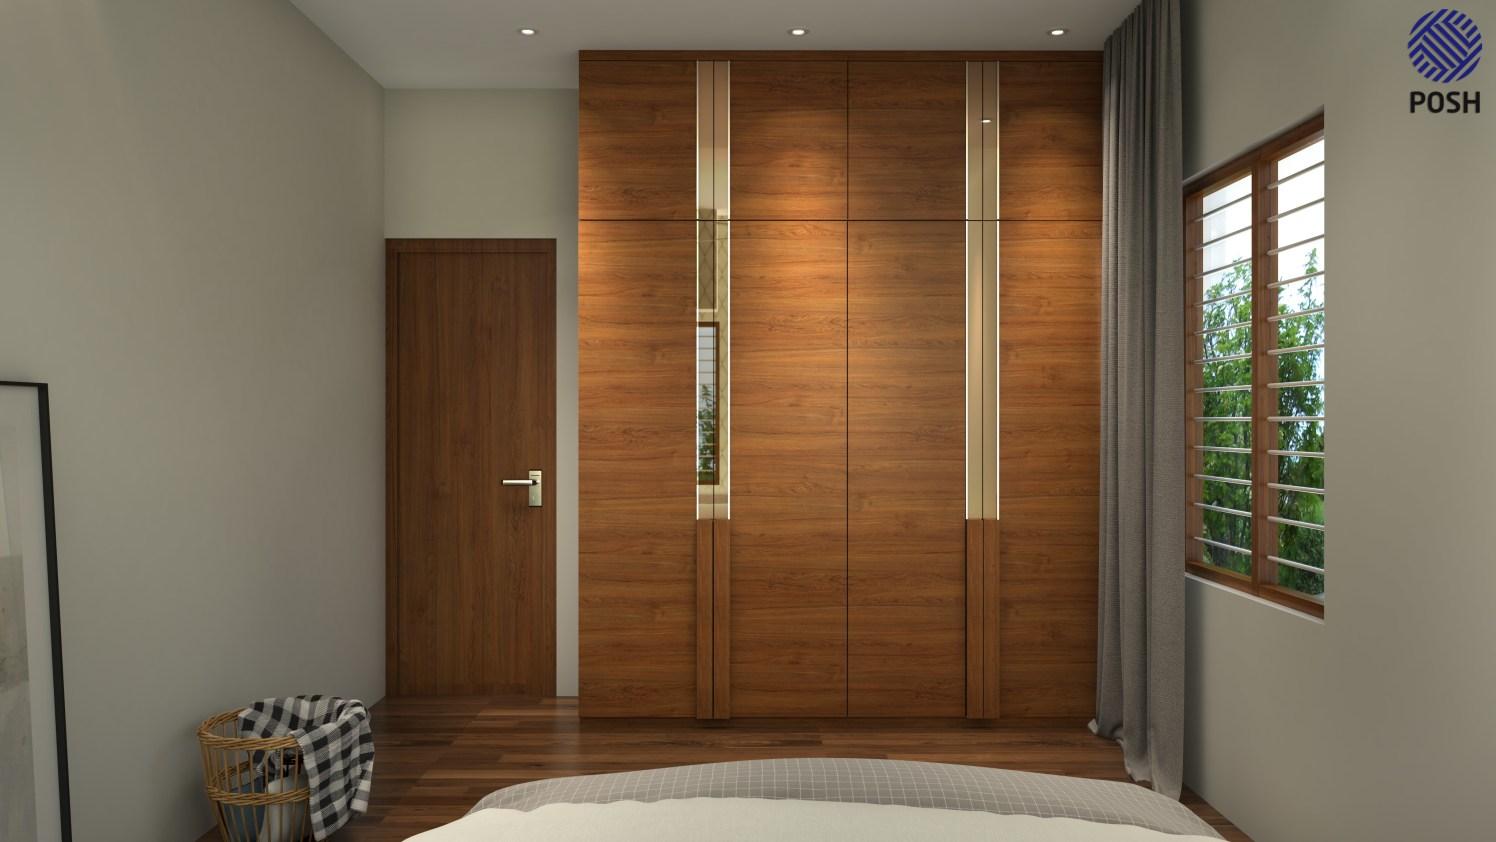 Contemporary wooden wardrobe by Priyanka Rai Bedroom Contemporary | Interior Design Photos & Ideas